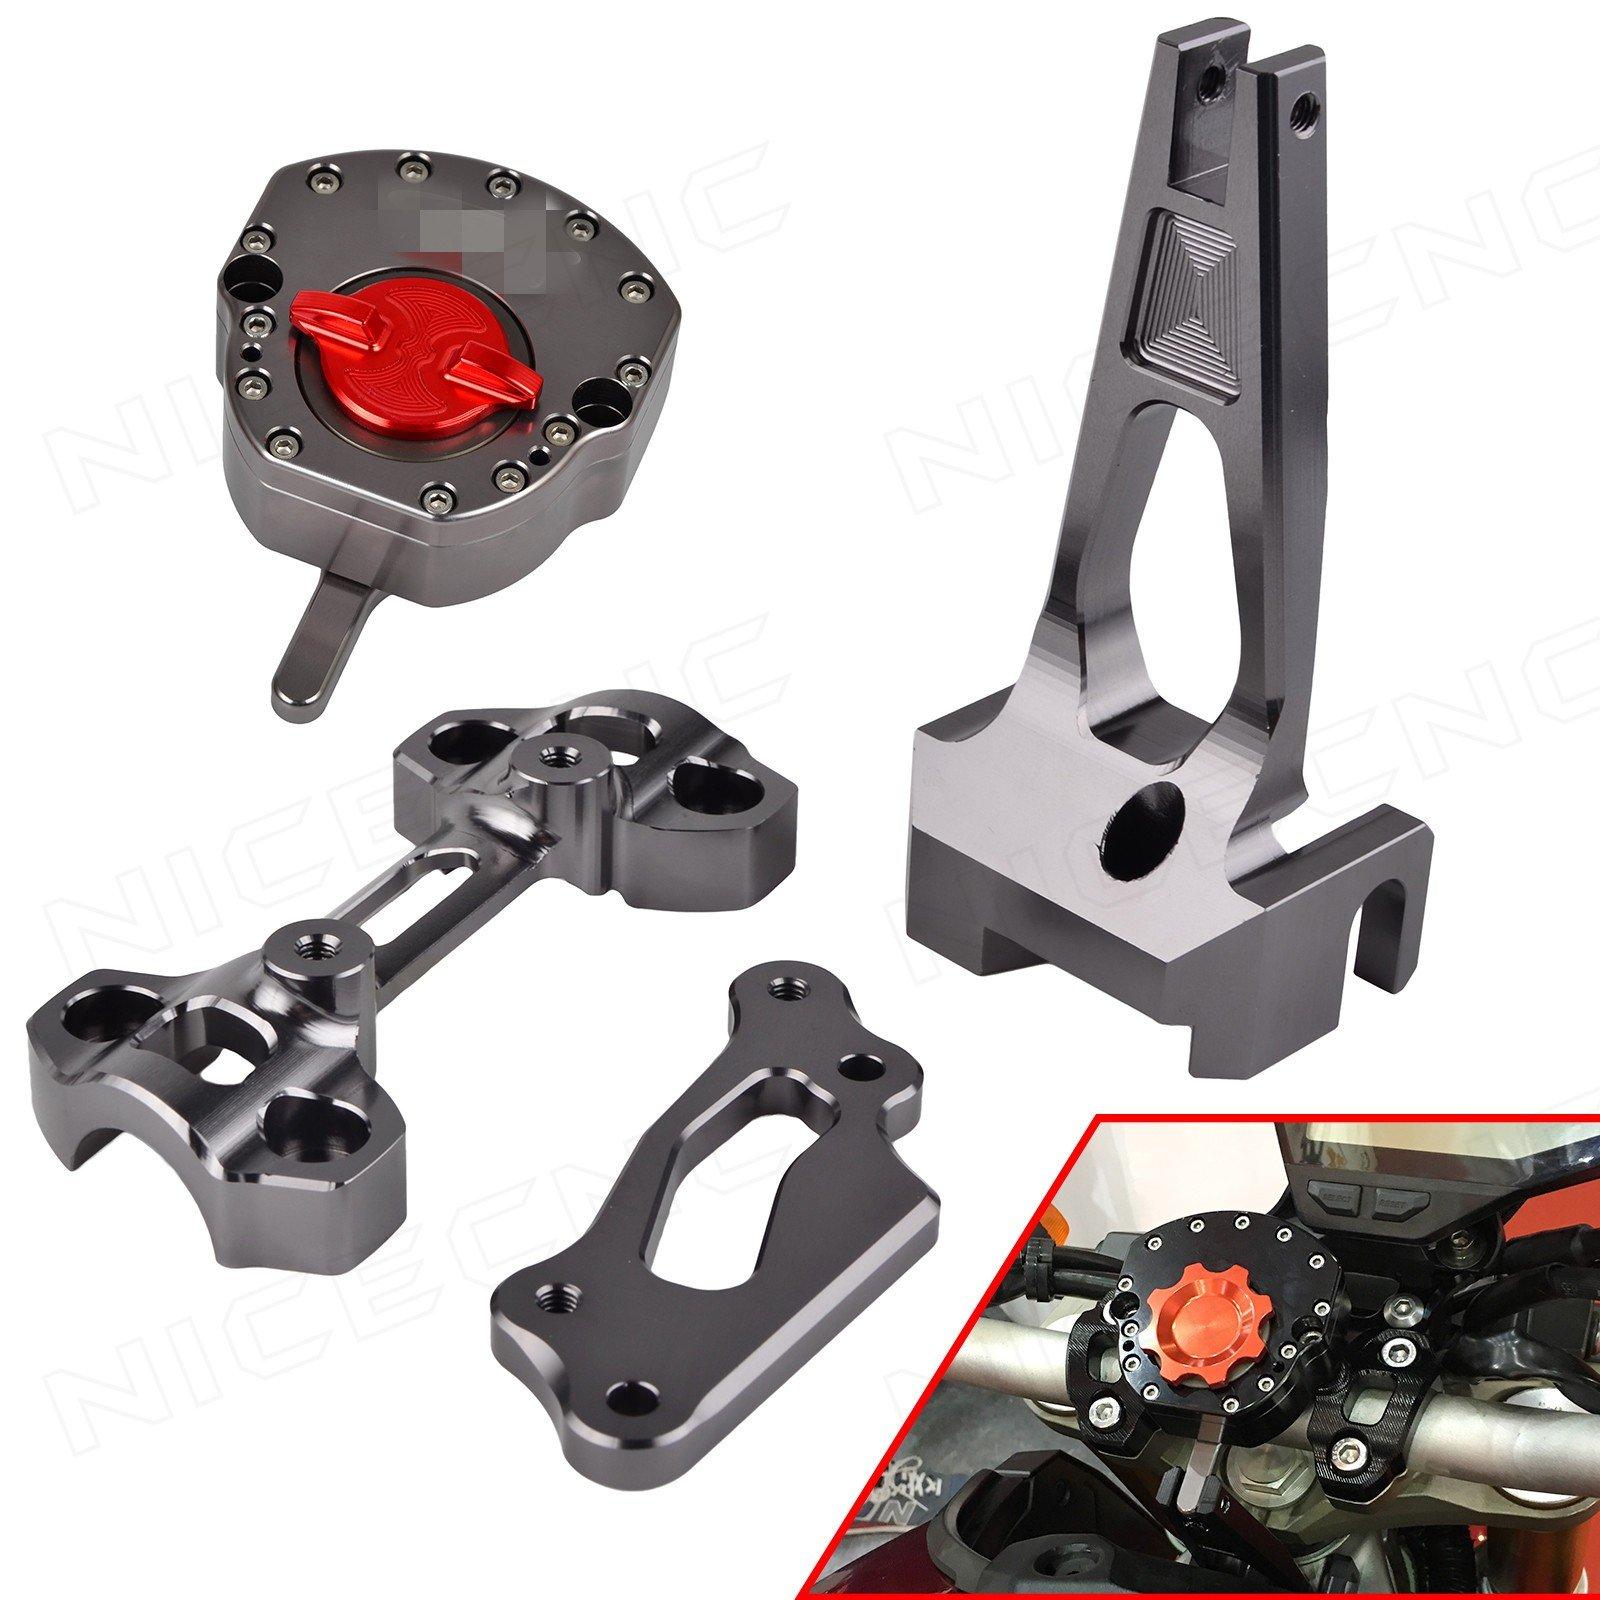 NICECNC Titanium Steering Stabilizer Damper & Mounting Bracket Set for MT09/MT-09 Street Rally FZ09 FZ-09 2014 2015 2016